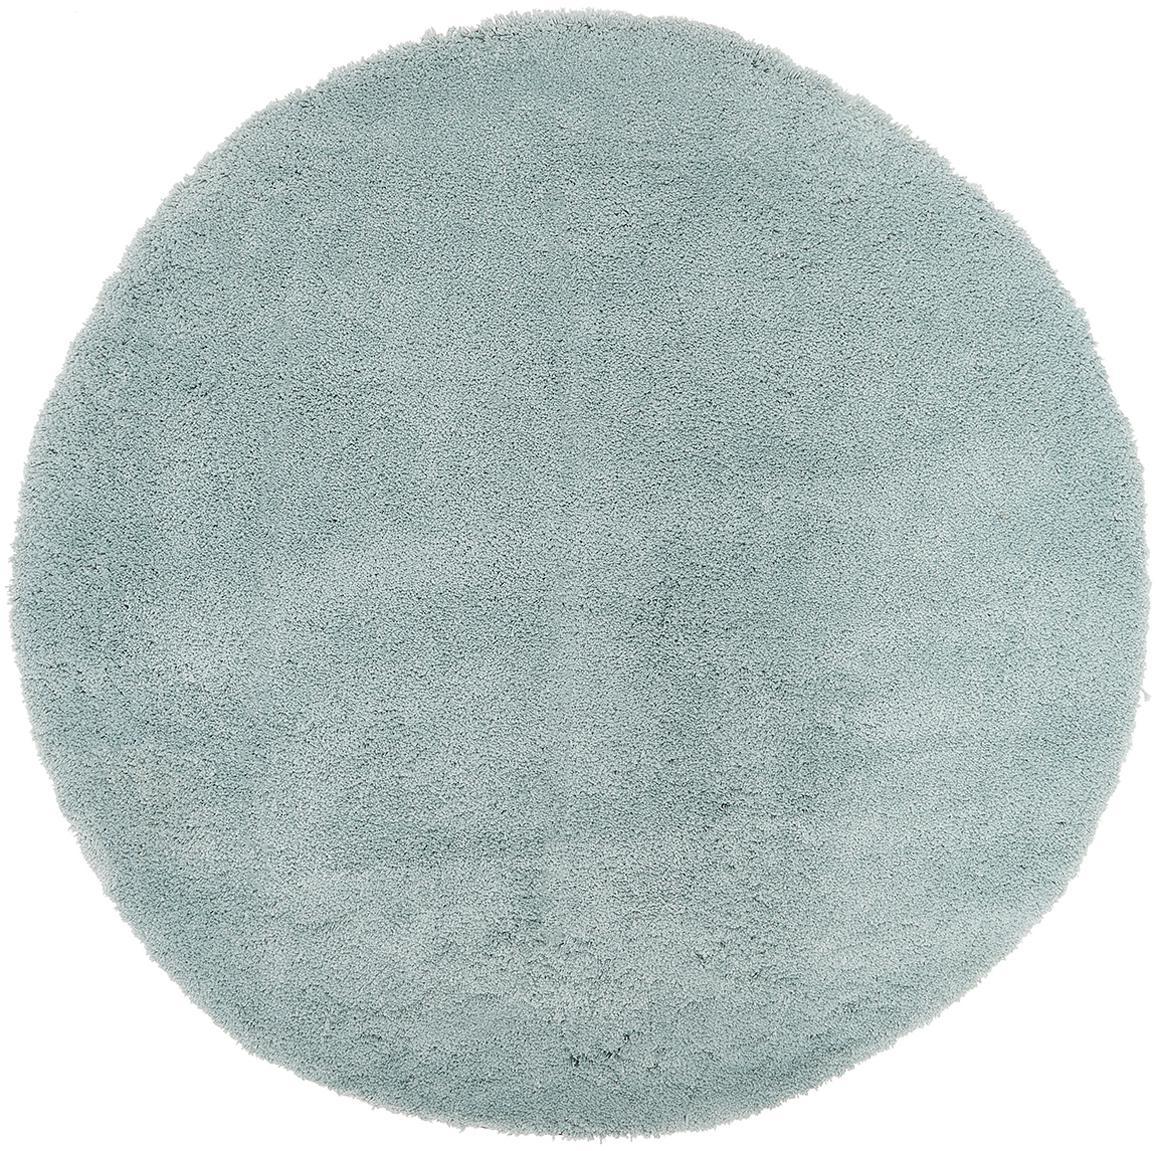 Alfombra redonda de pelo largo Leighton, Parte superior: 100%poliéster (microfibr, Reverso: 100%poliéster, Verde menta, Ø 120 cm (Tamaño S)